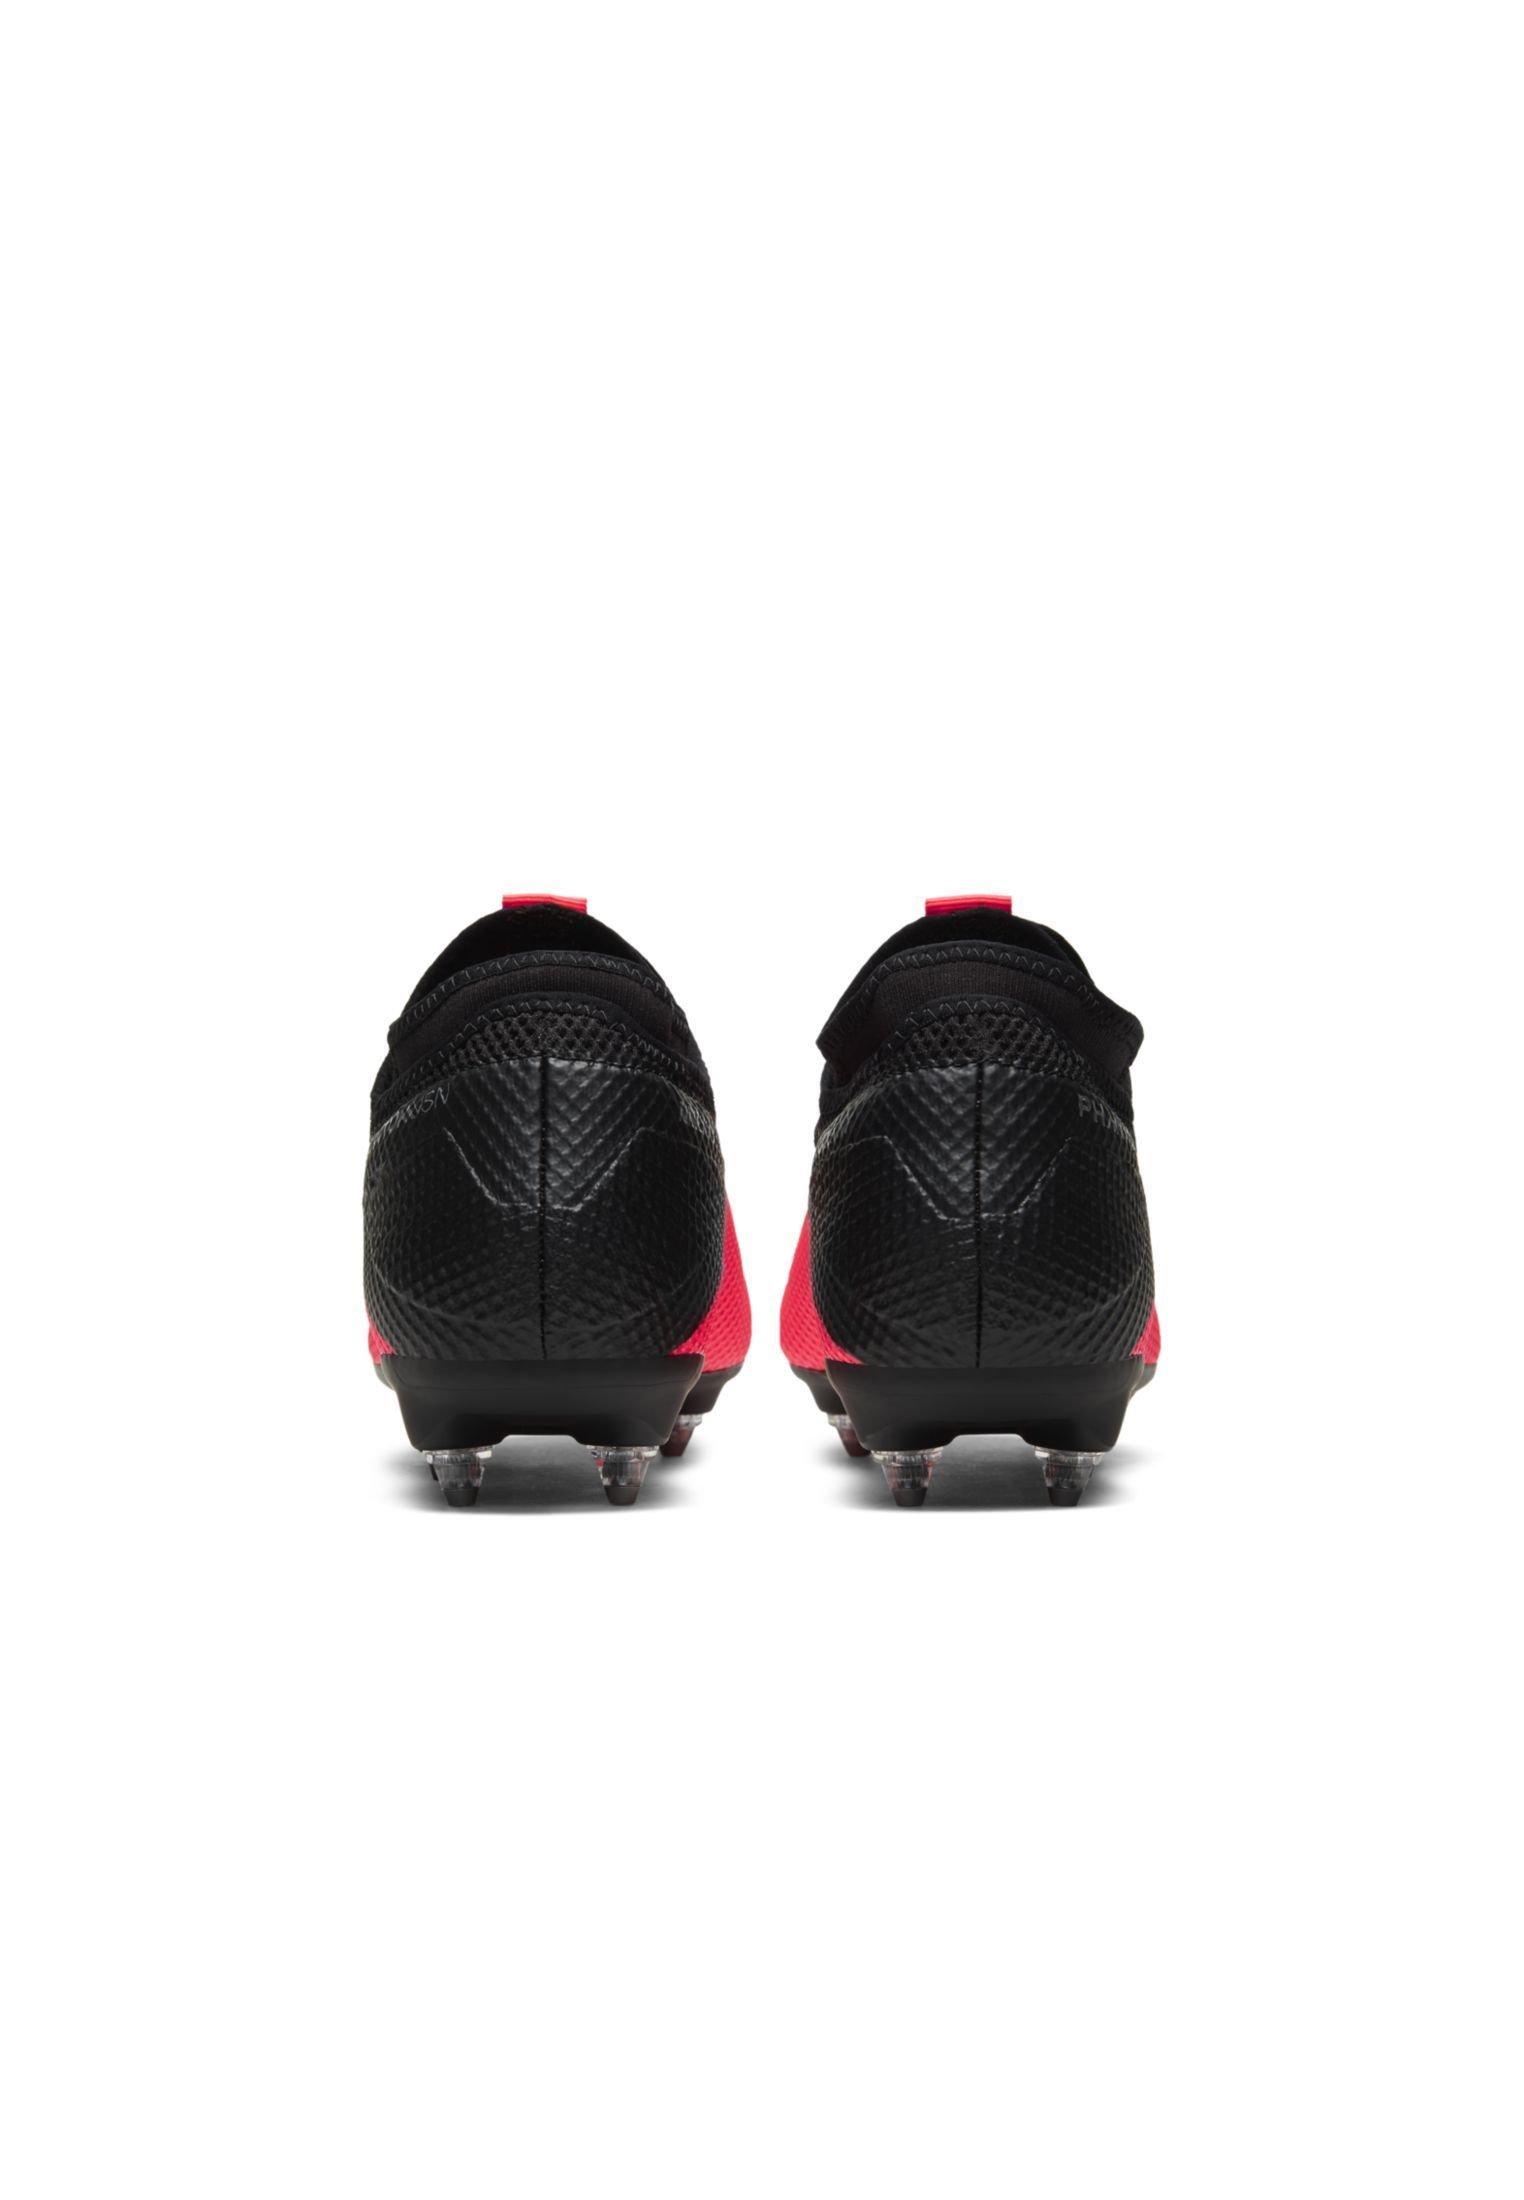 Nike Performance PHANTOM VISION 2 ACADEMY DF SGPROAC - Chaussures de foot à lamelles - laser crimson/black/metallic silver